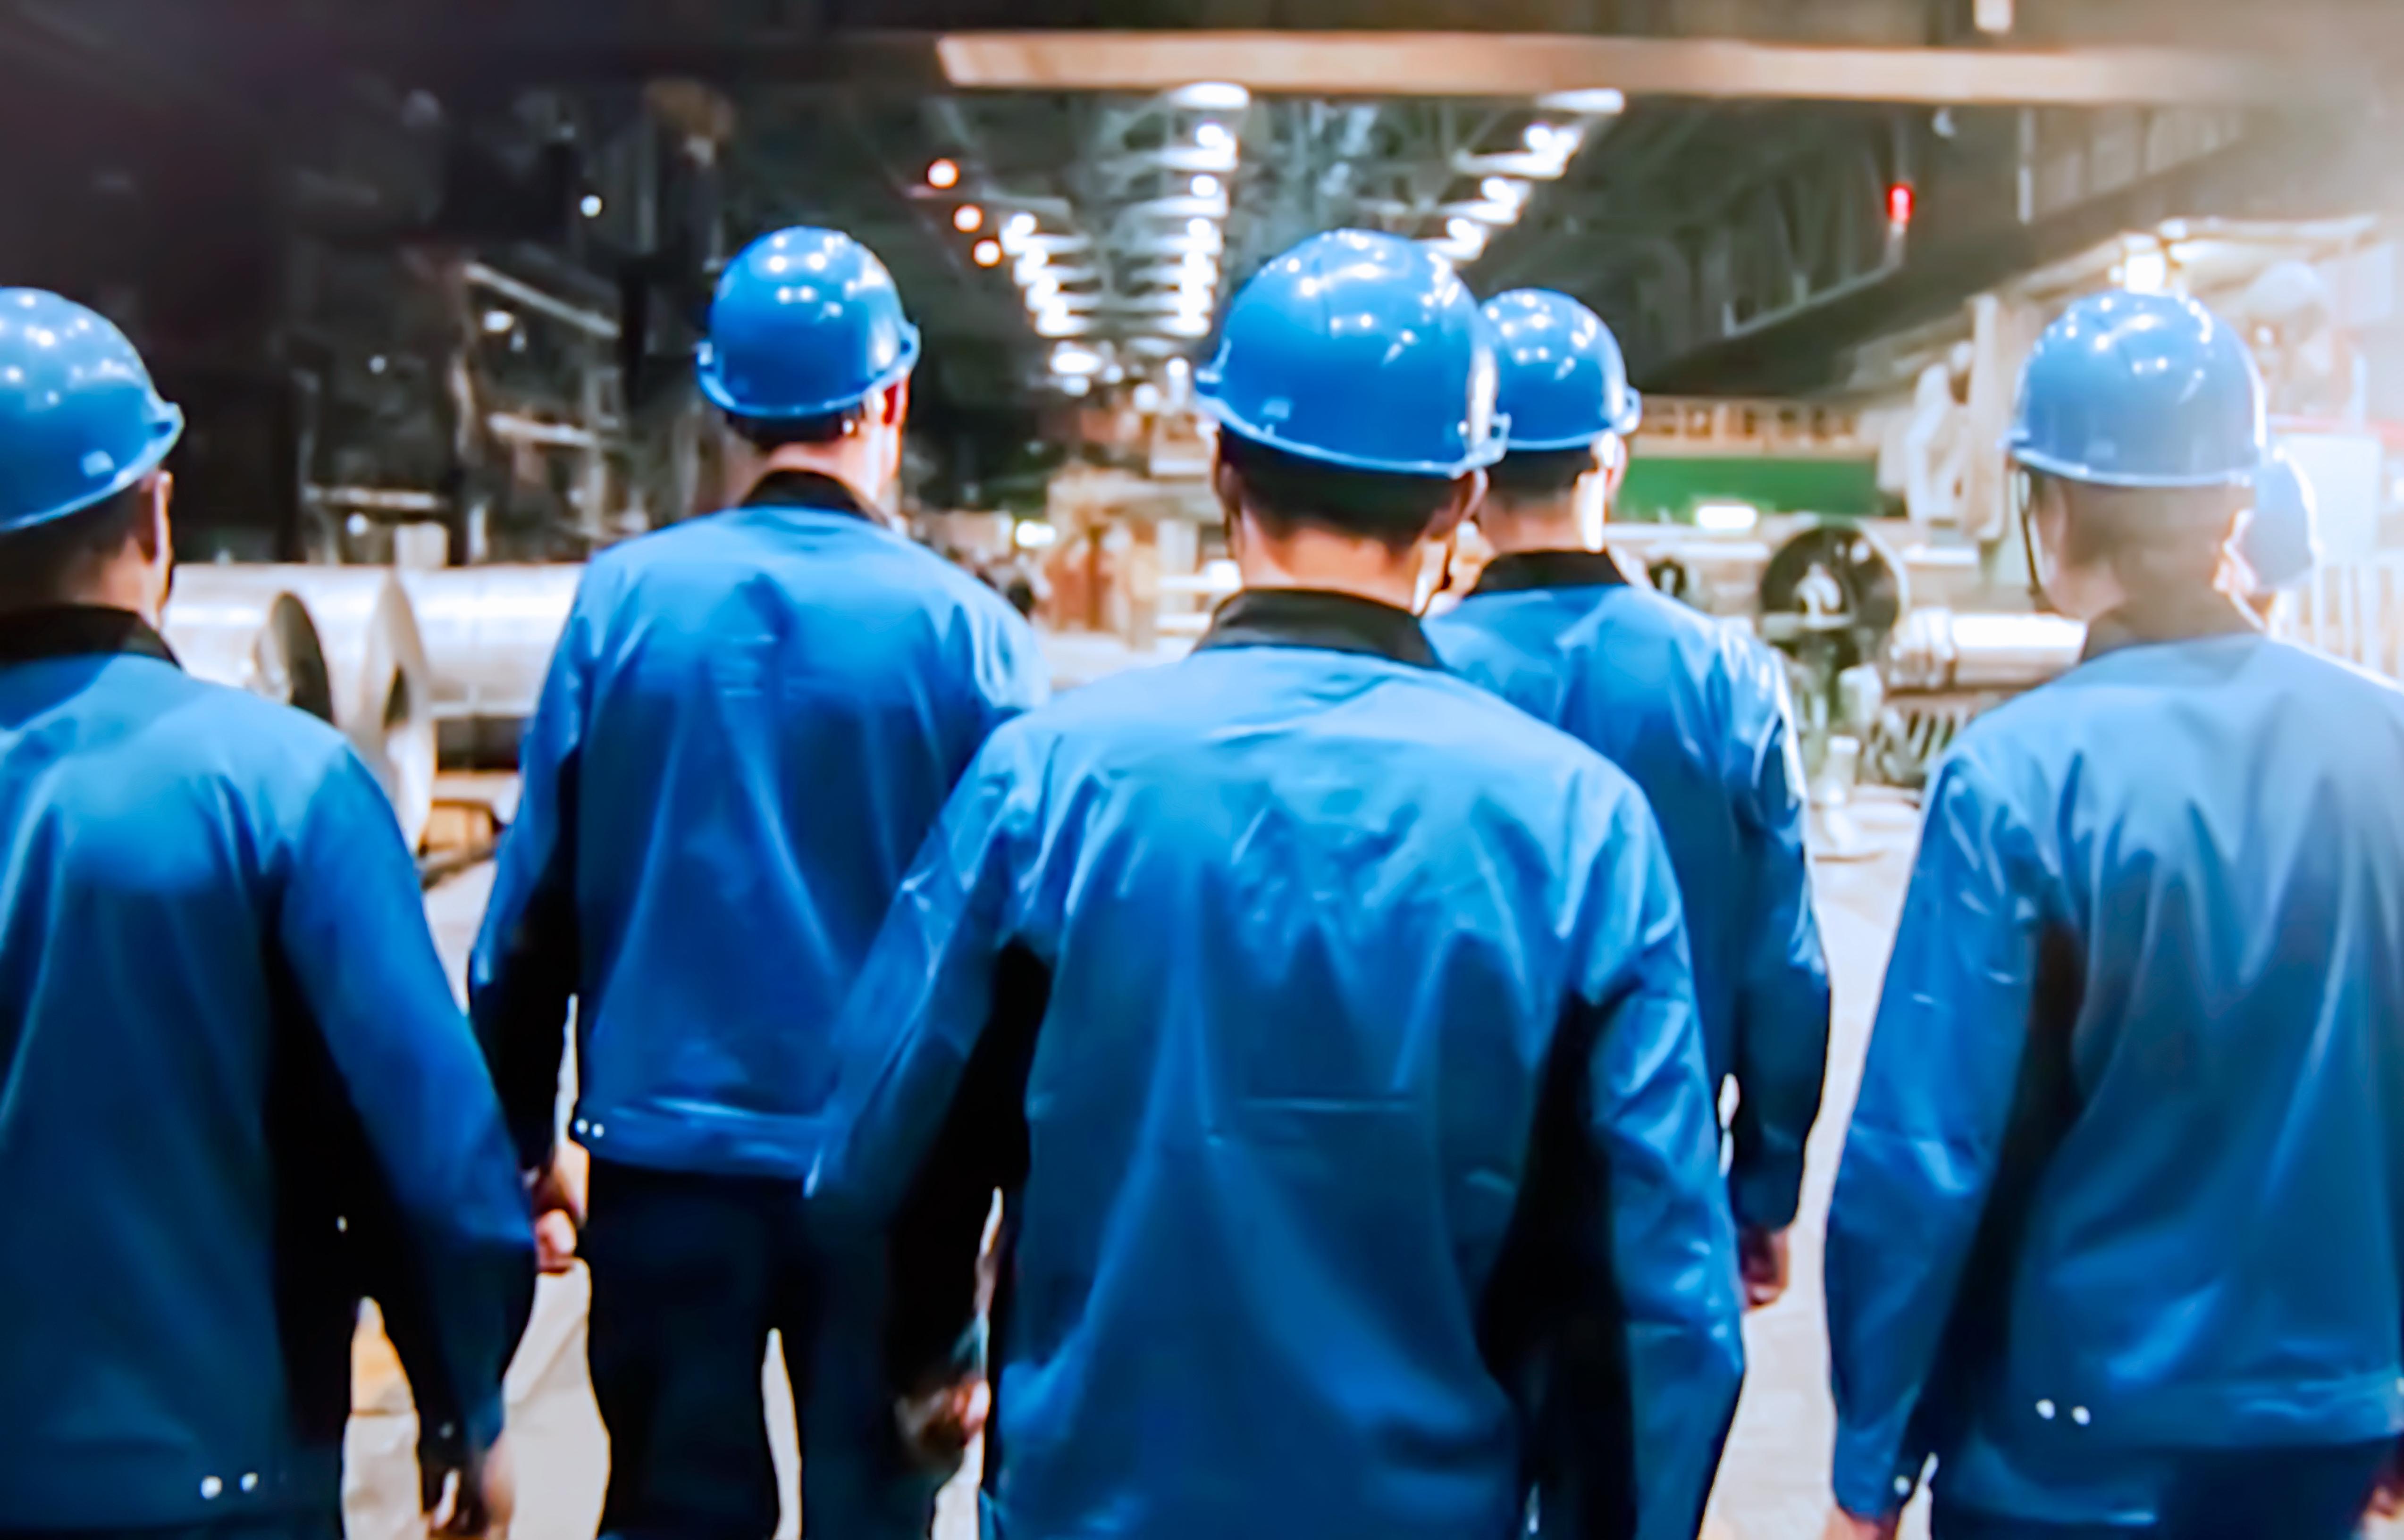 manufacturing millennial